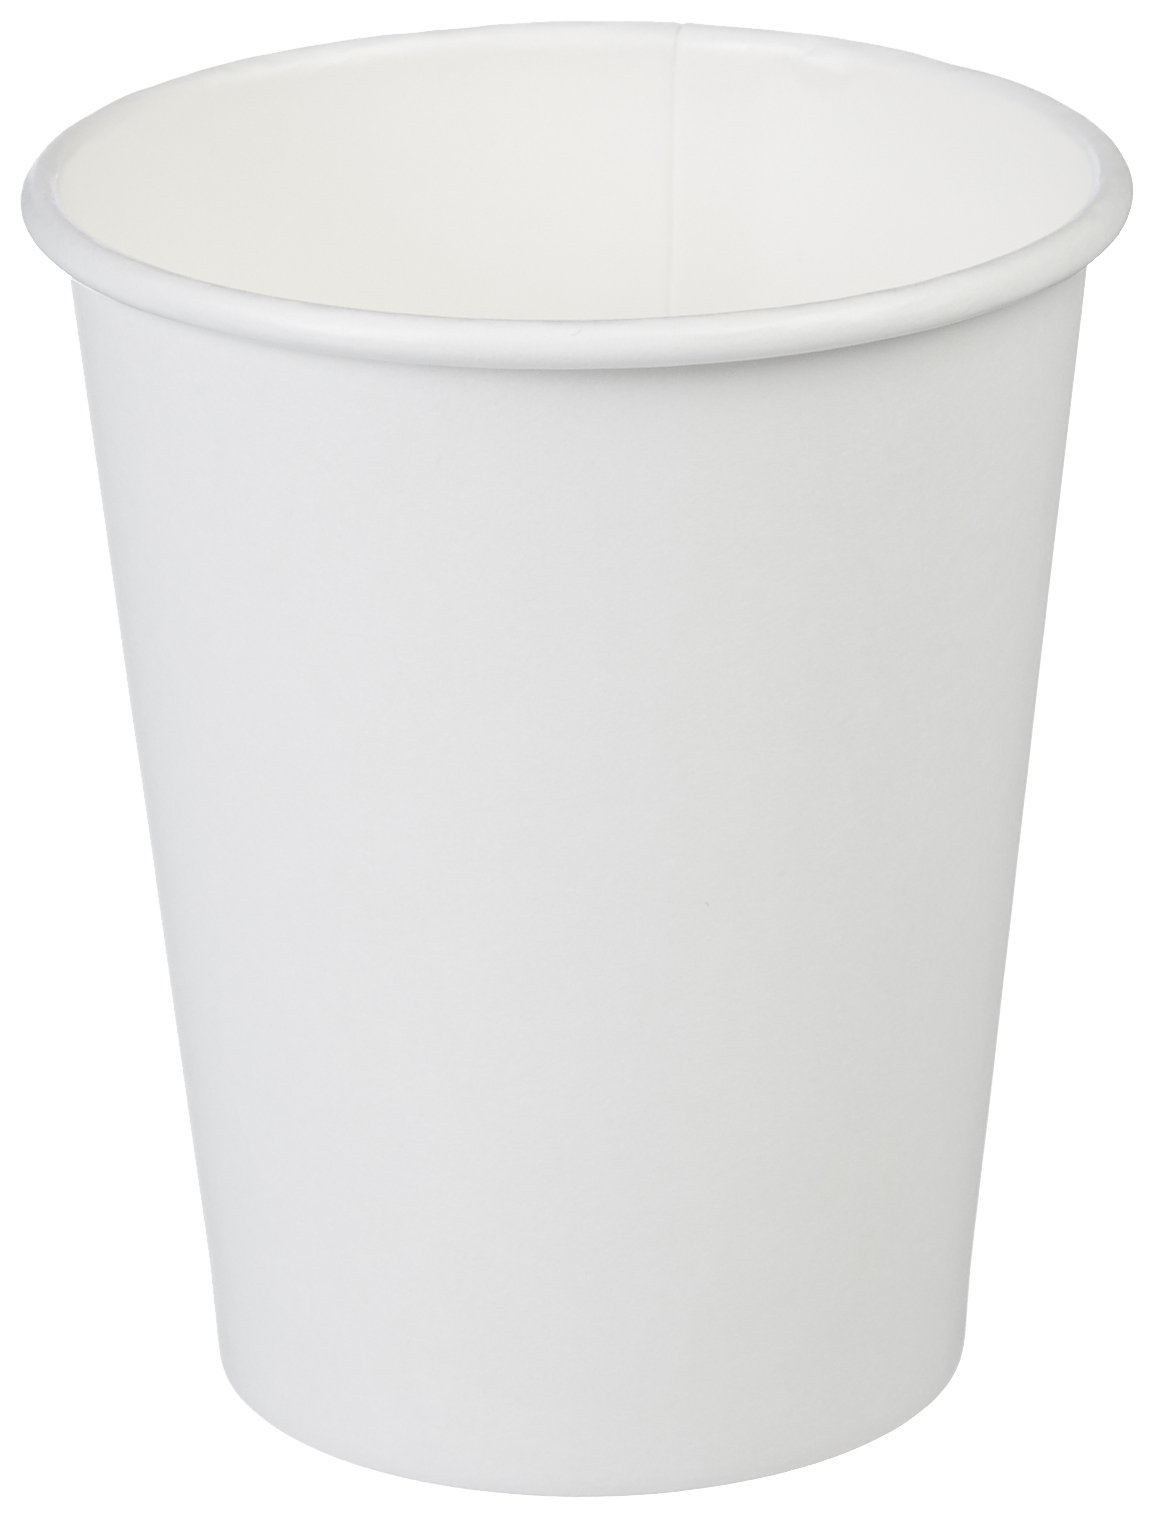 Amazon Basics Paper Hot Cup, 8 oz, 1,000 Count